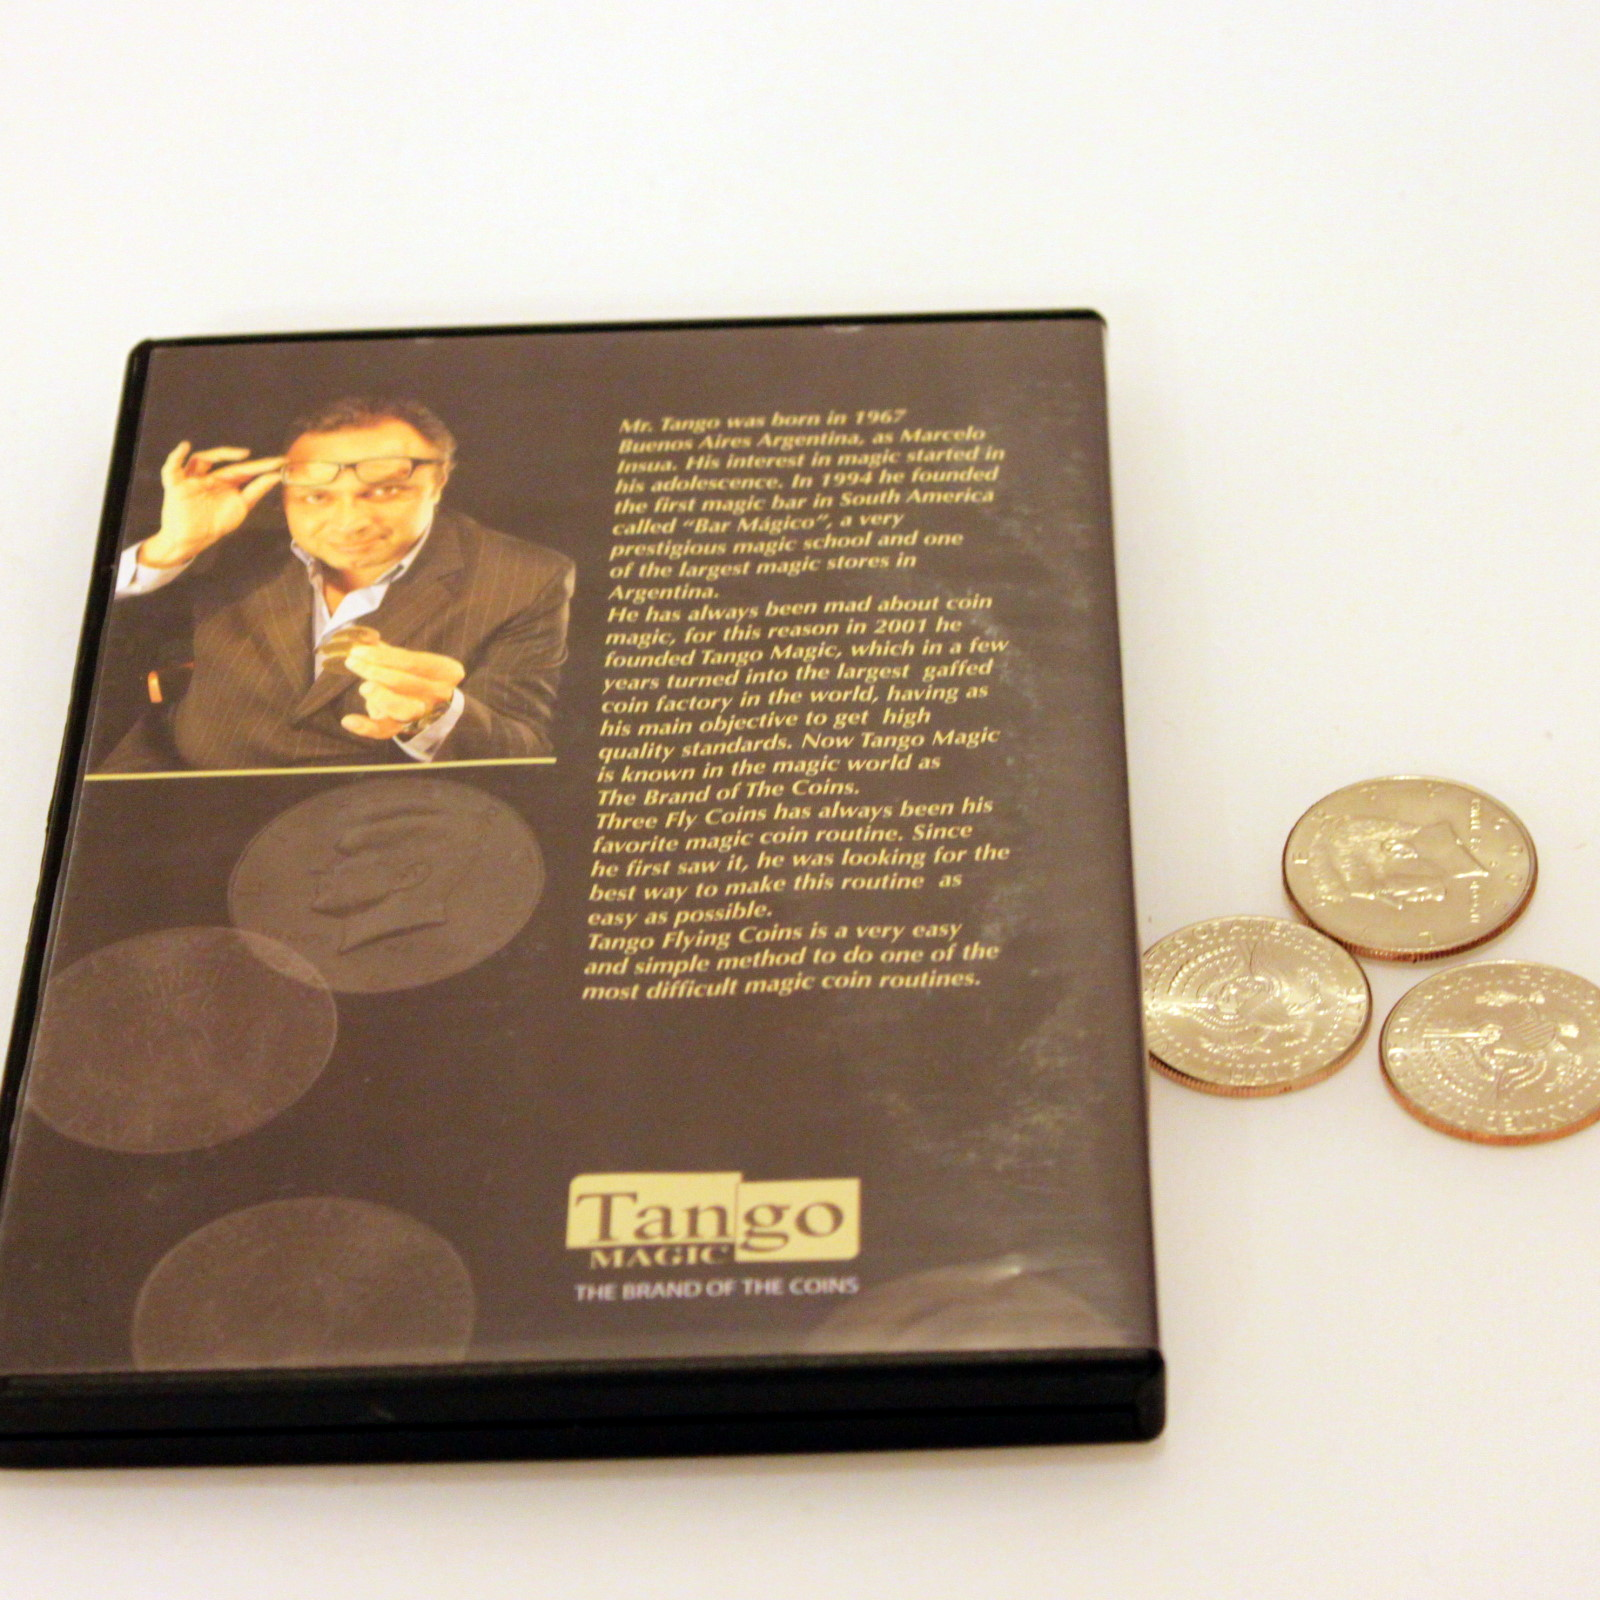 Tango Flying Coins by Tango Magic